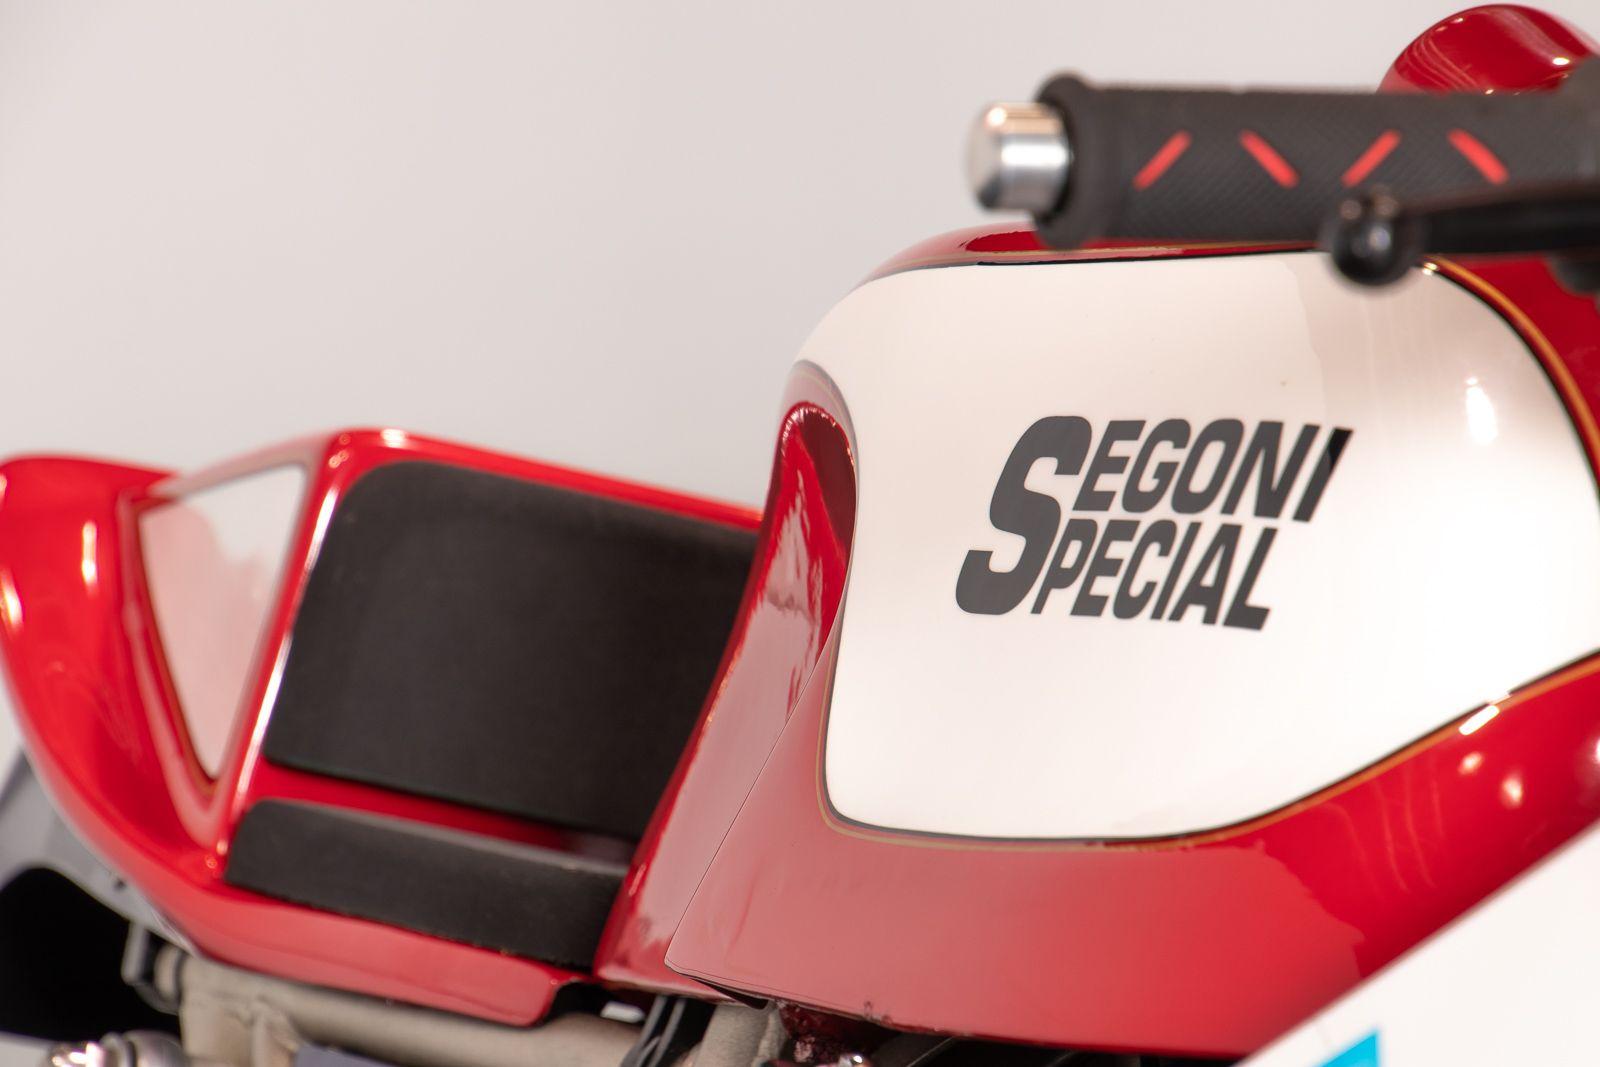 1984 Kawasaki Segoni 750 46348